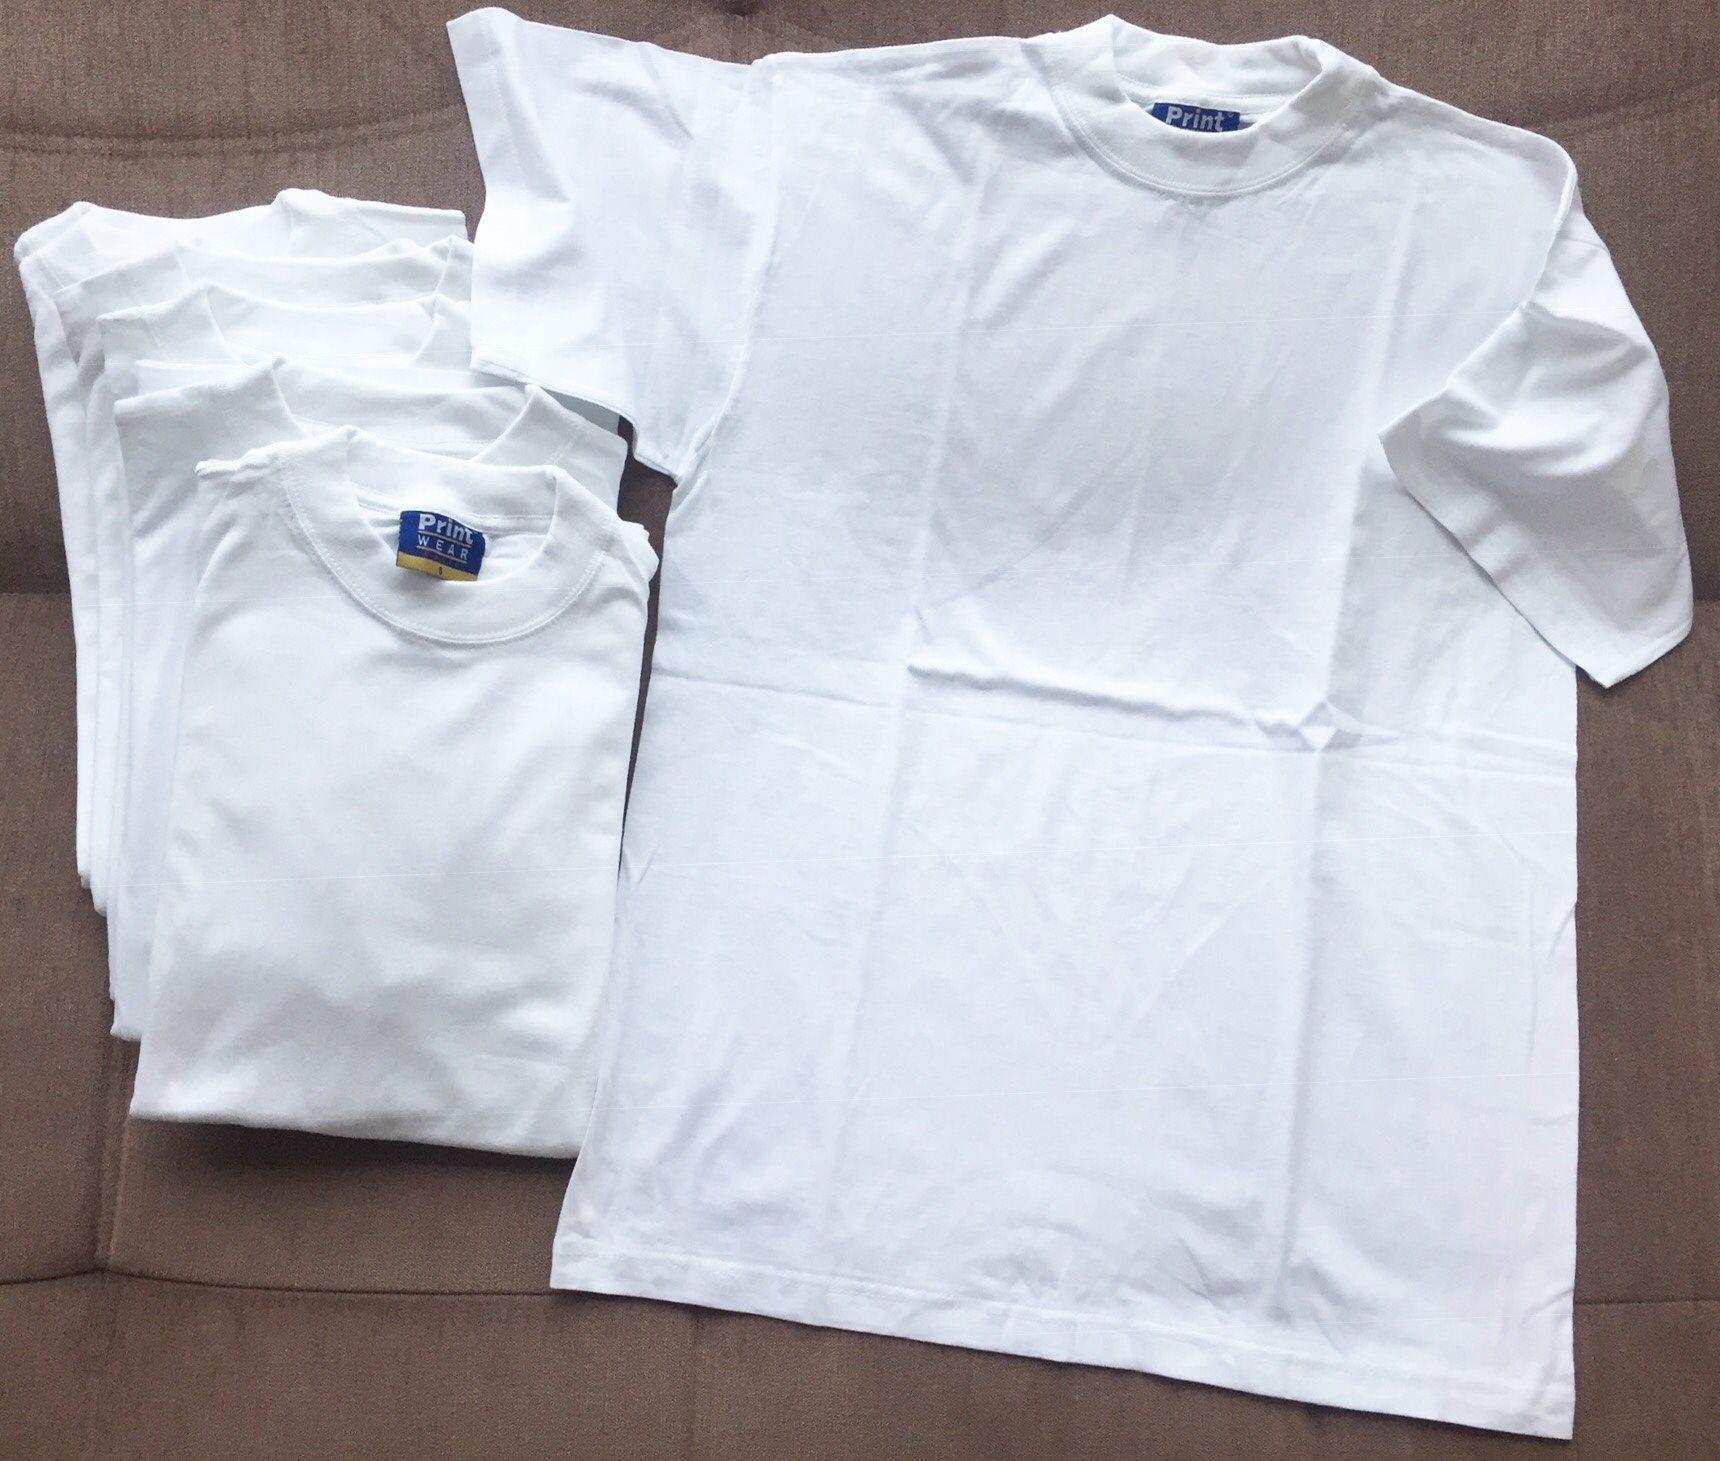 tröjor utan tryck